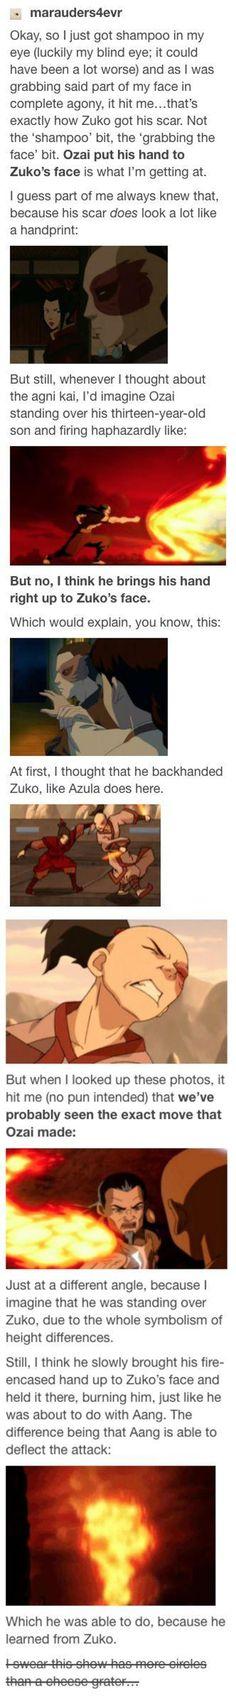 Avatar The Last Airbender Funny, The Last Avatar, Avatar Funny, Avatar Airbender, Avatar Aang, Fandoms, Satire, Atla Memes, Sneak Attack